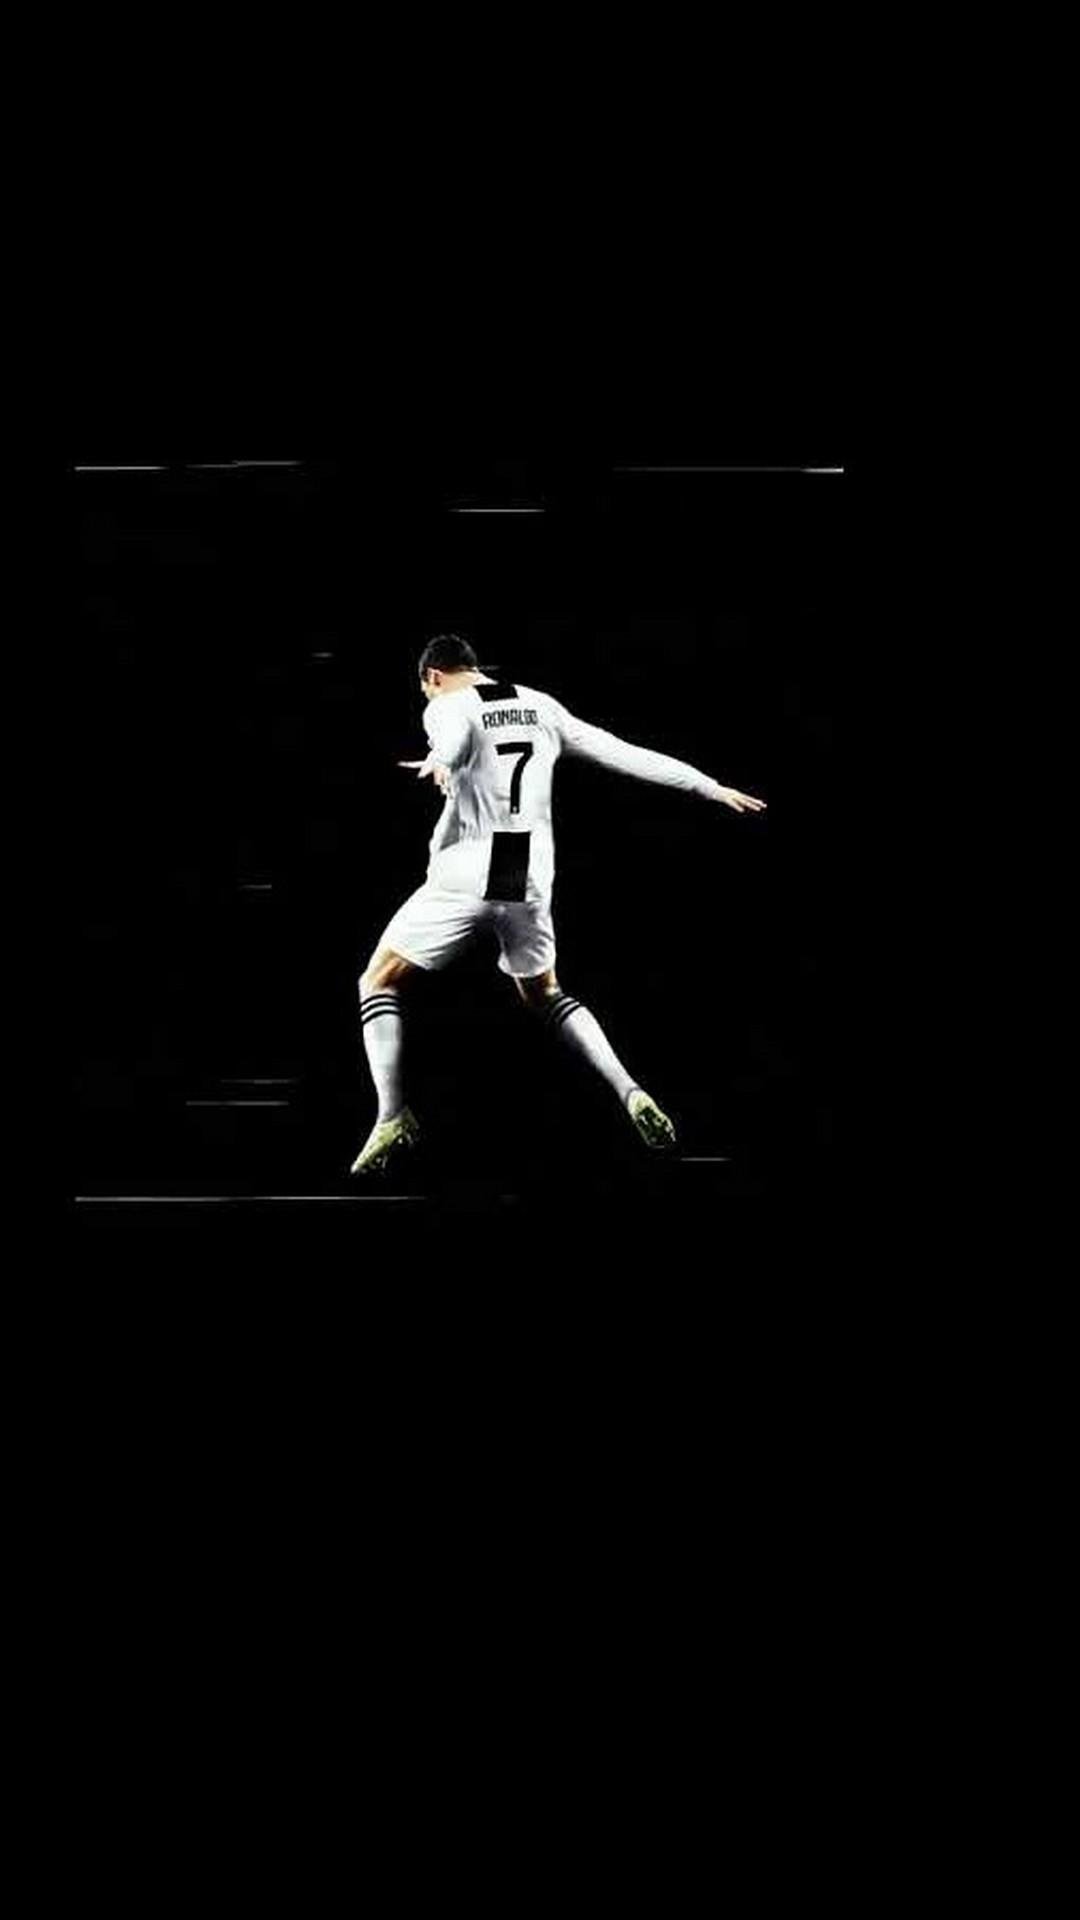 iPhone Wallpaper Cristiano Ronaldo Juventus 2020 3D iPhone Wallpaper 1080x1920